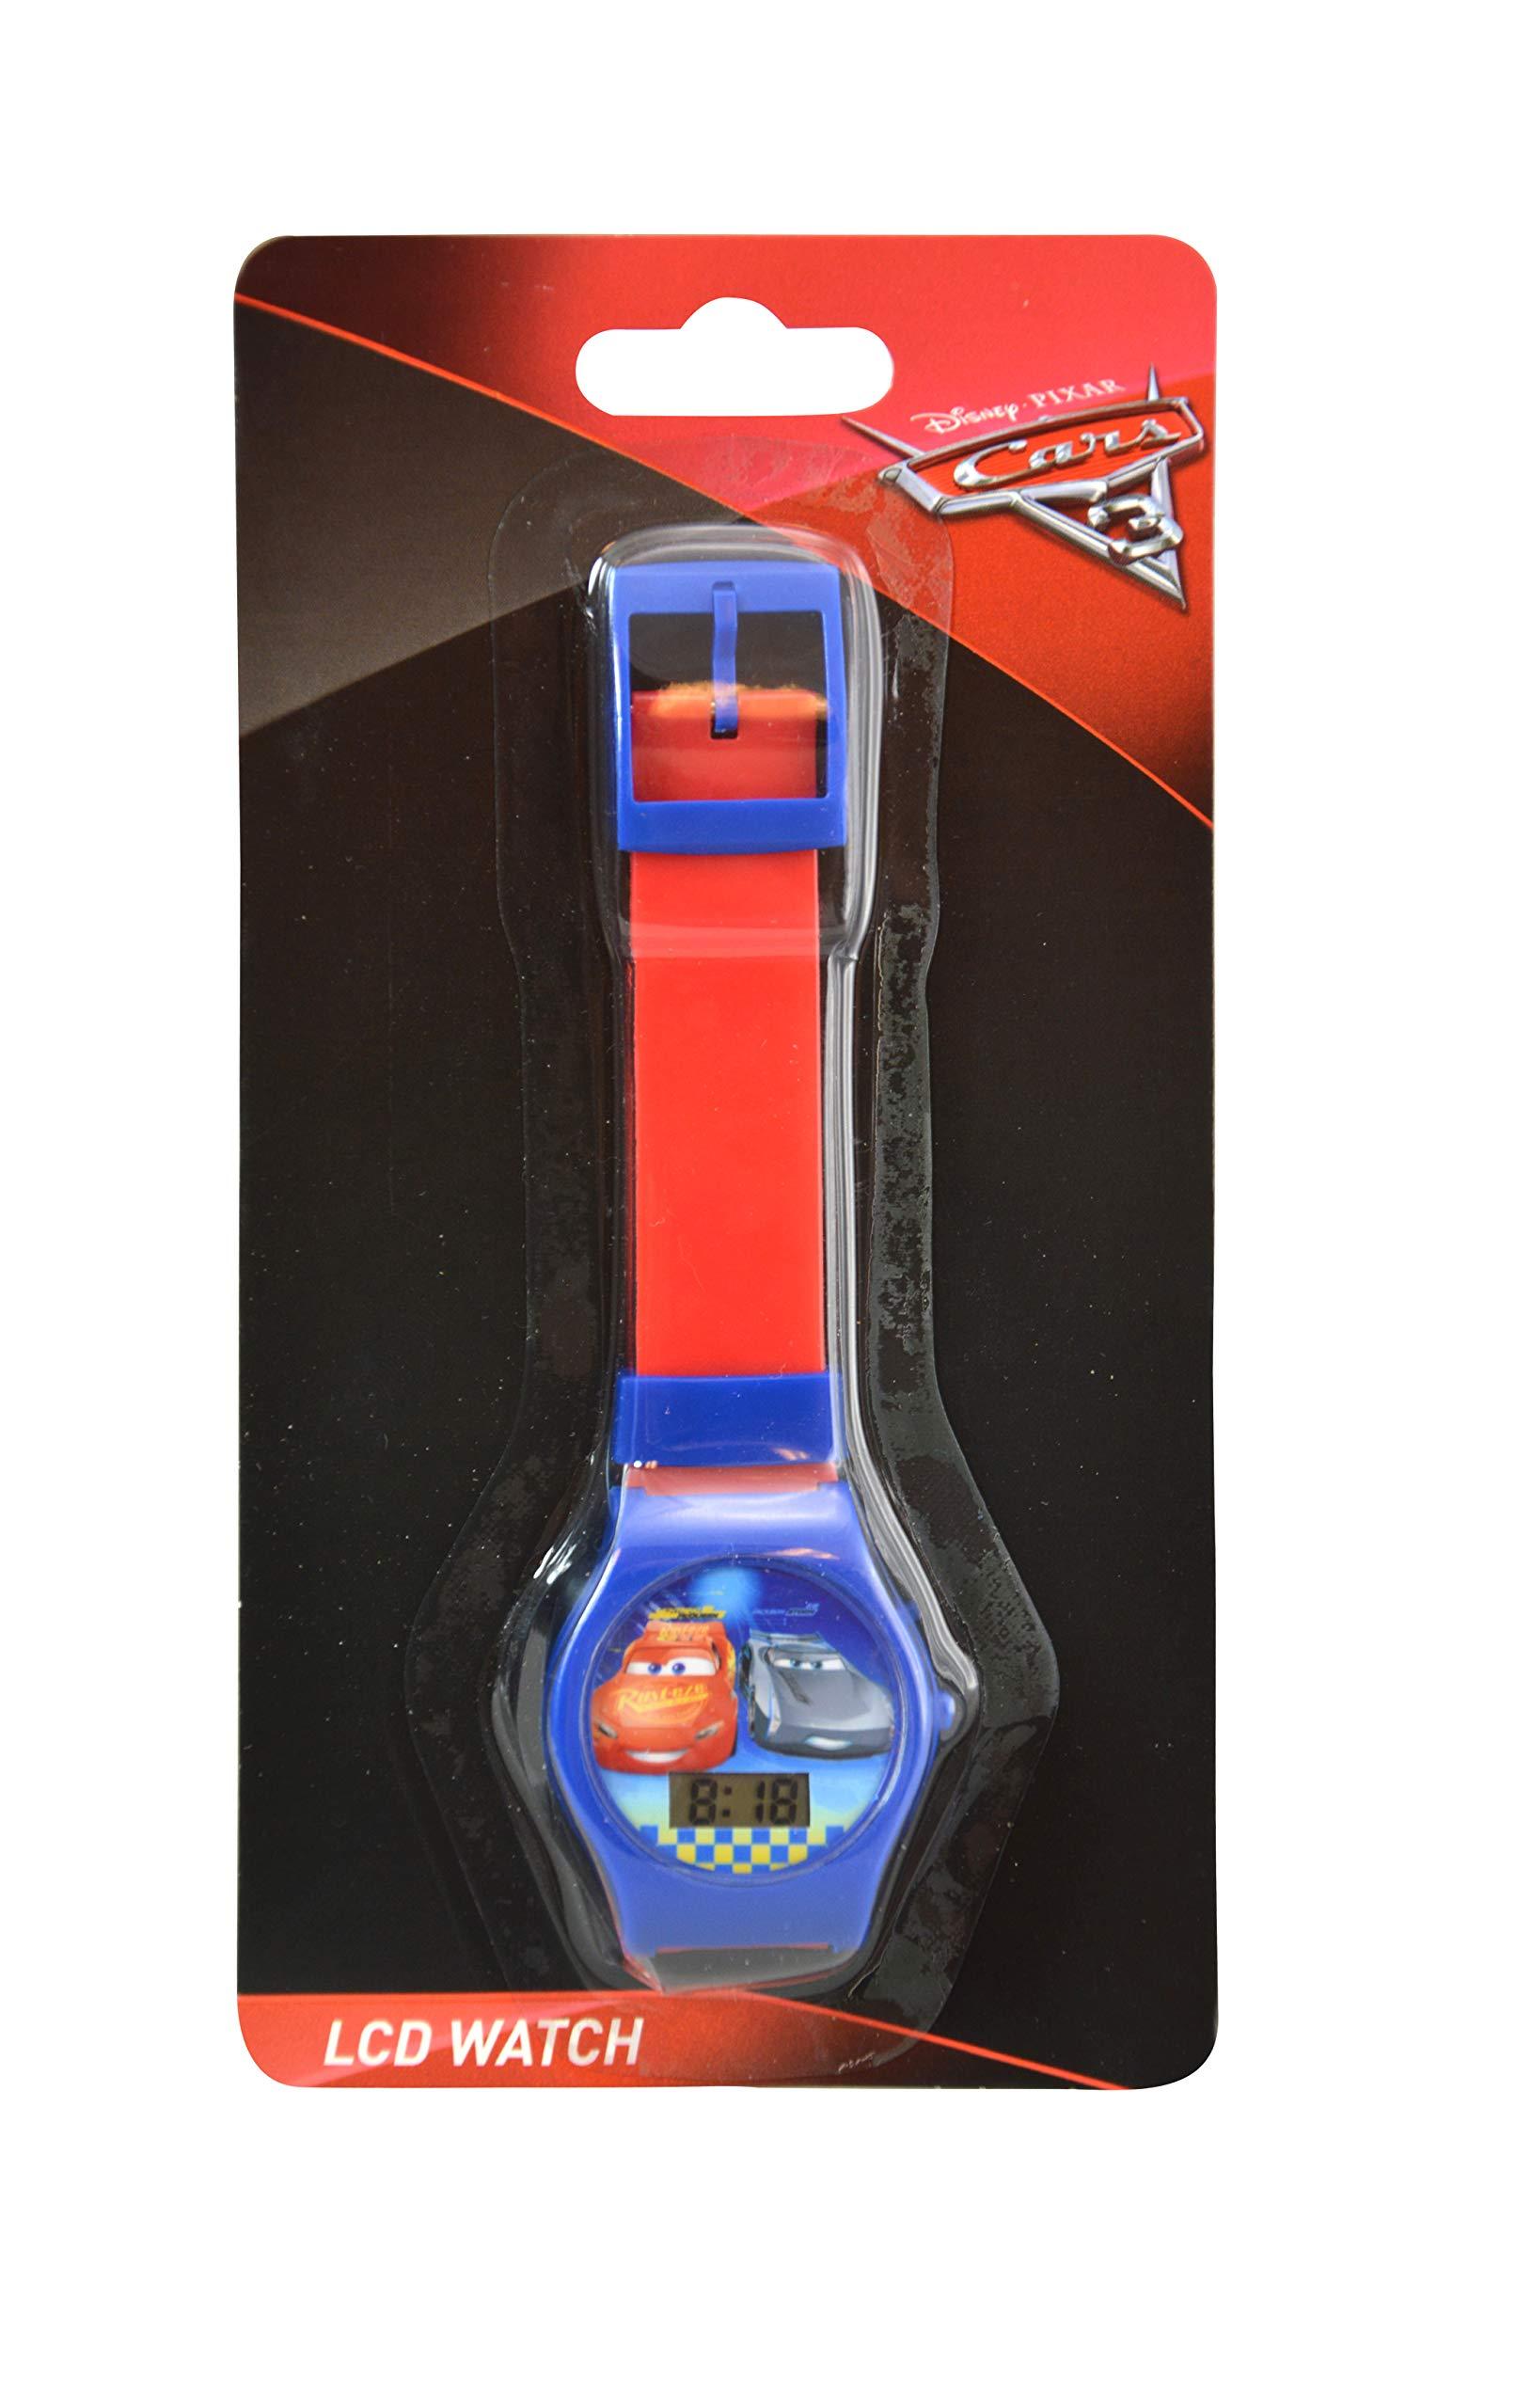 Karacter Box Disney Cars 3 LCD Digital Watch, 6-Pack Party Favors by Karacter Box (Image #2)